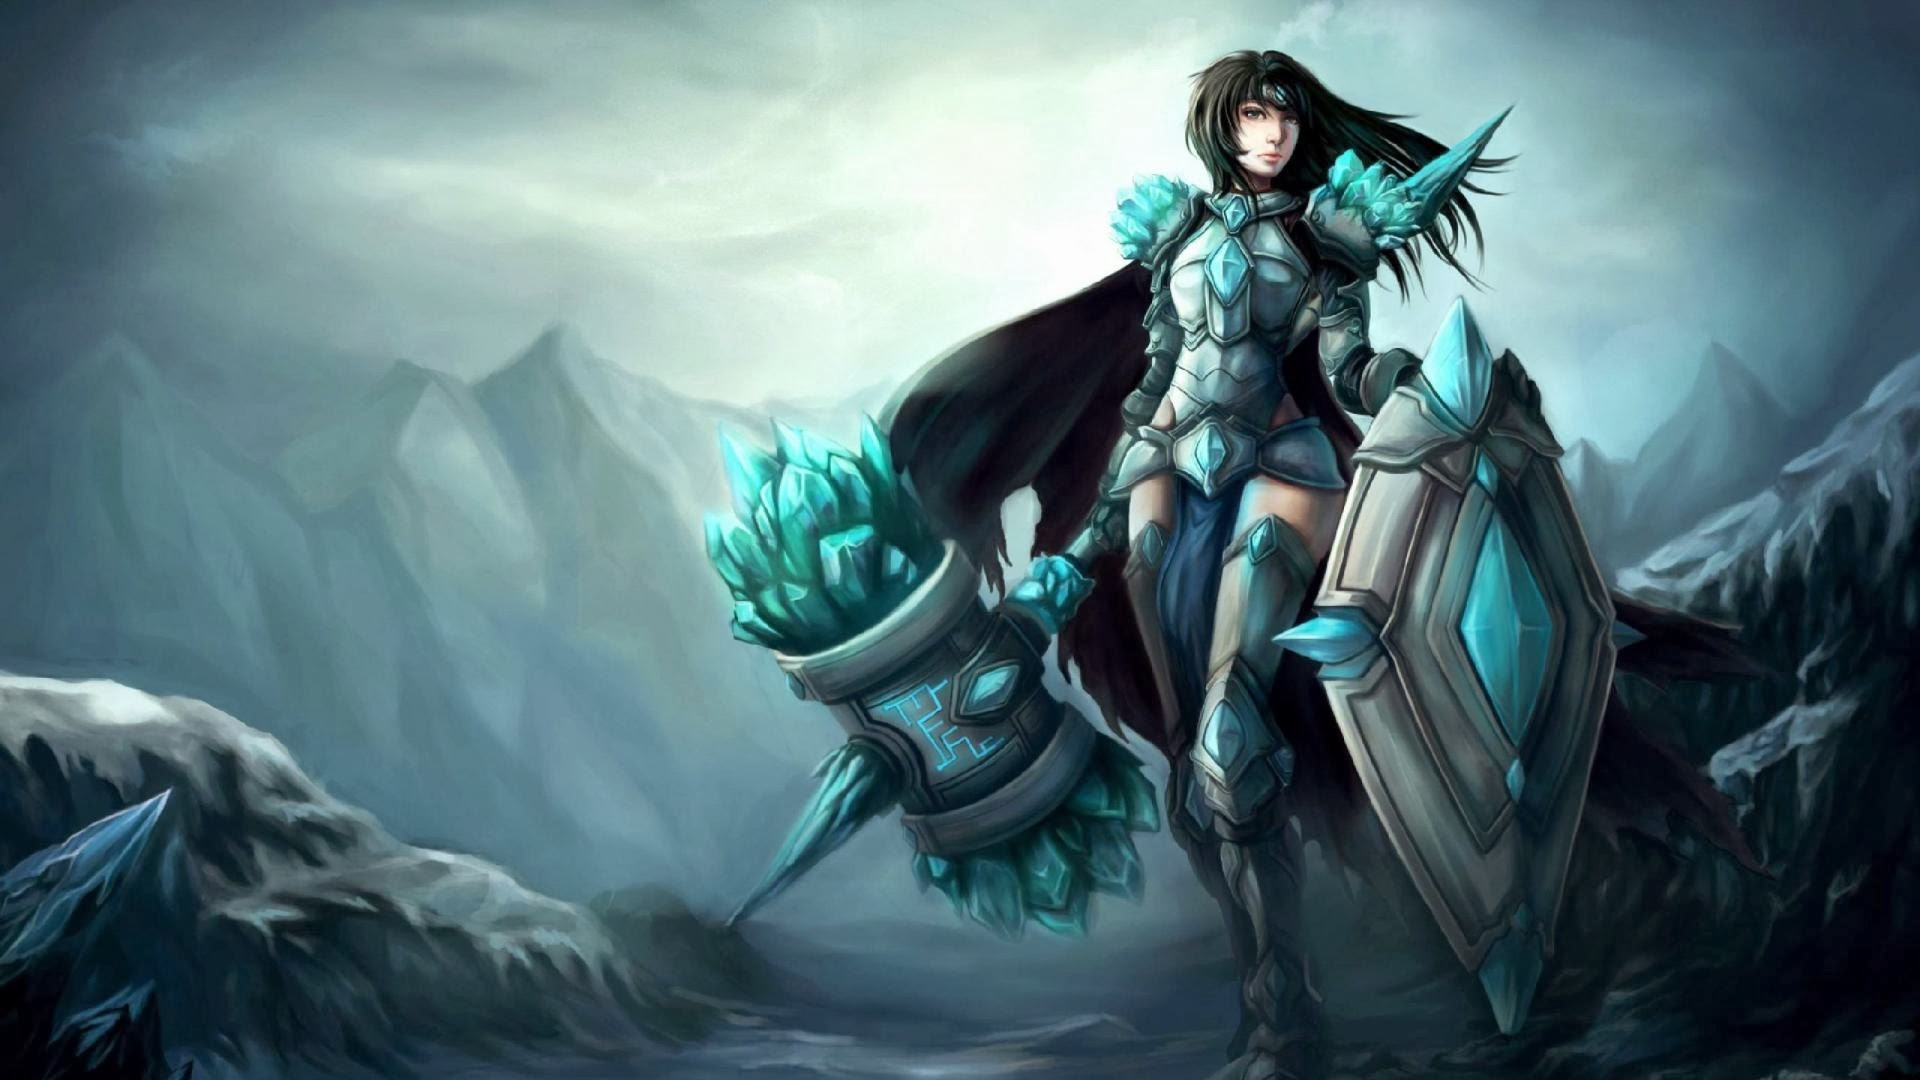 Rengar League Of Legends HD Wallpapers Backgrounds